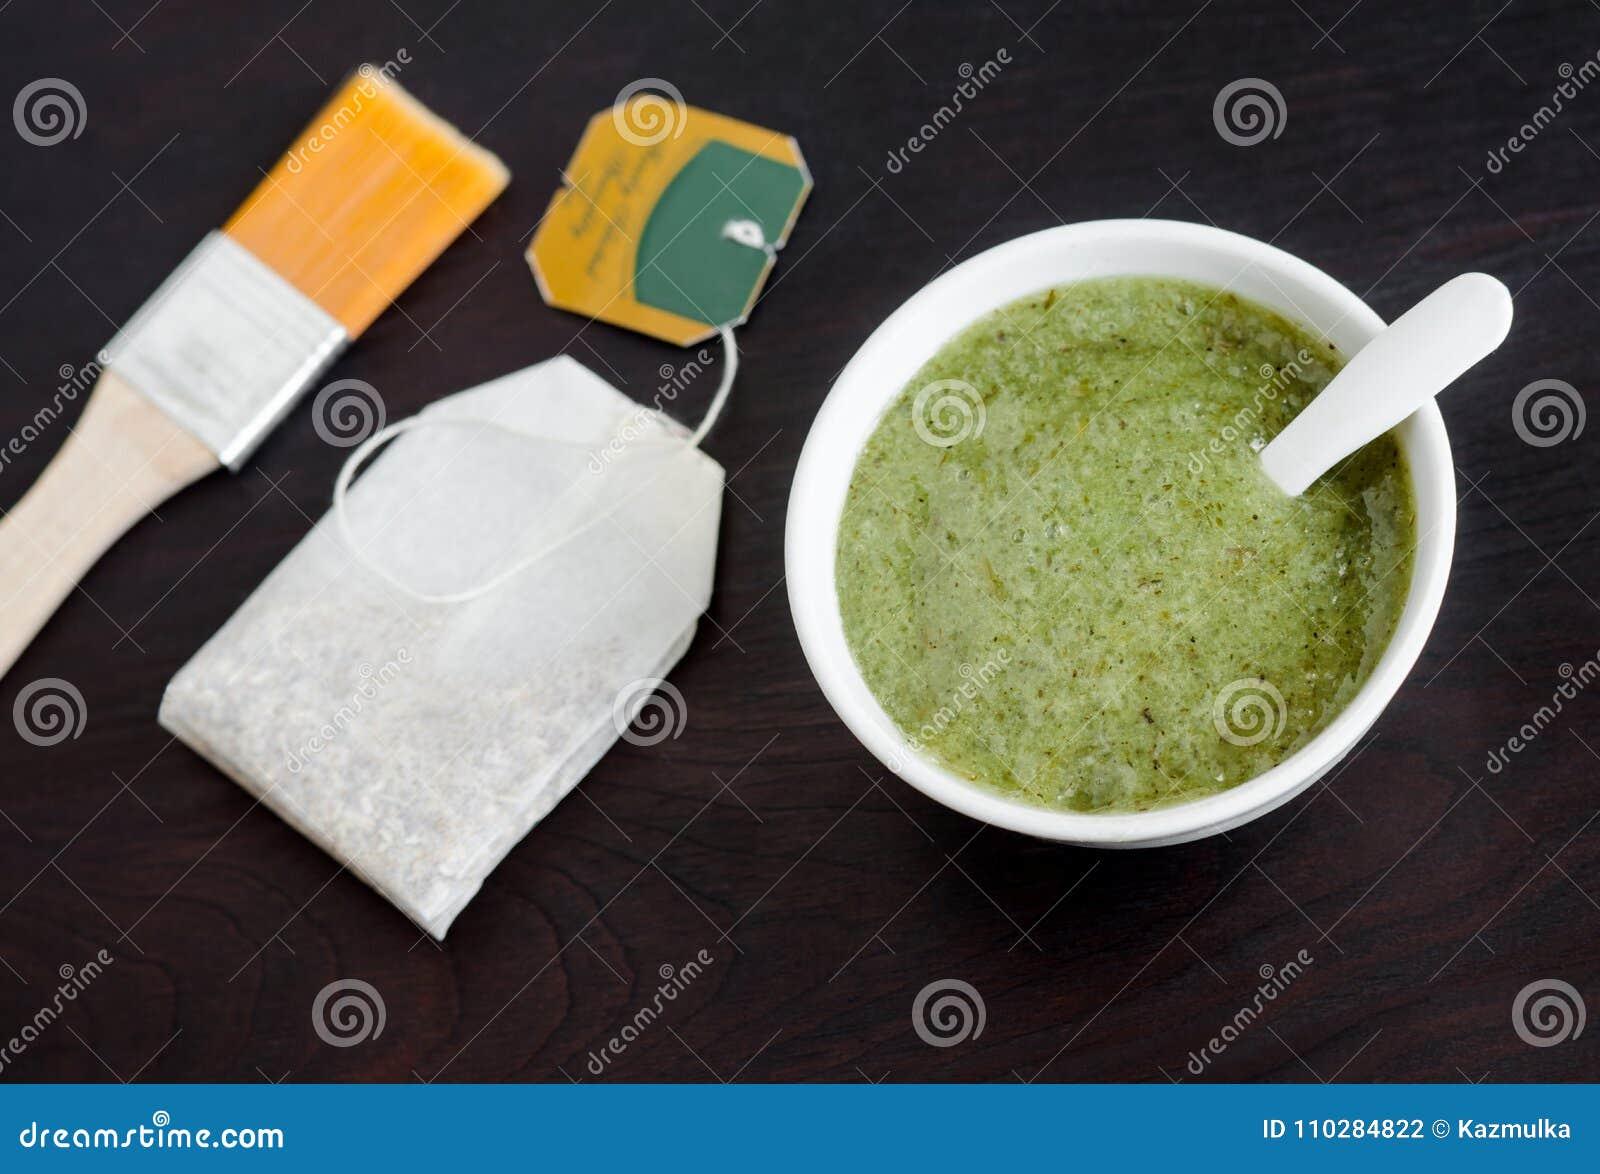 Homemade natural mask scrub with sea salt and green tea extract. Diy cosmetics.